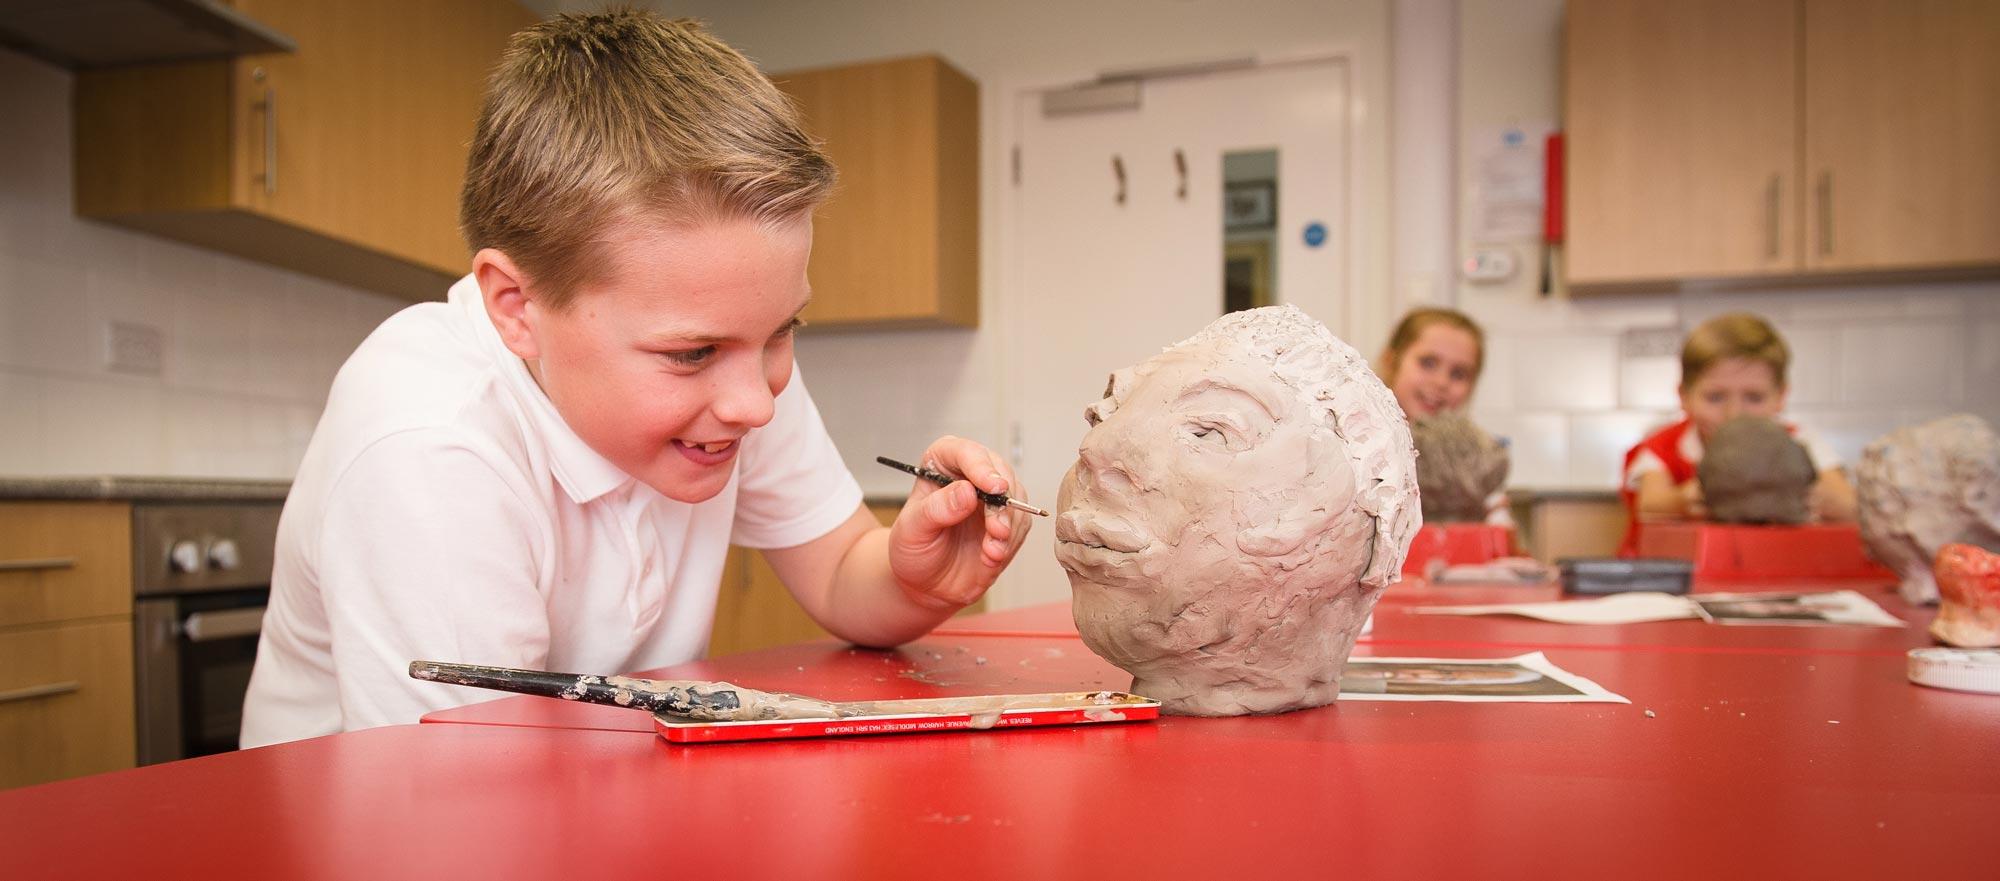 boy_making_clay_sculpture